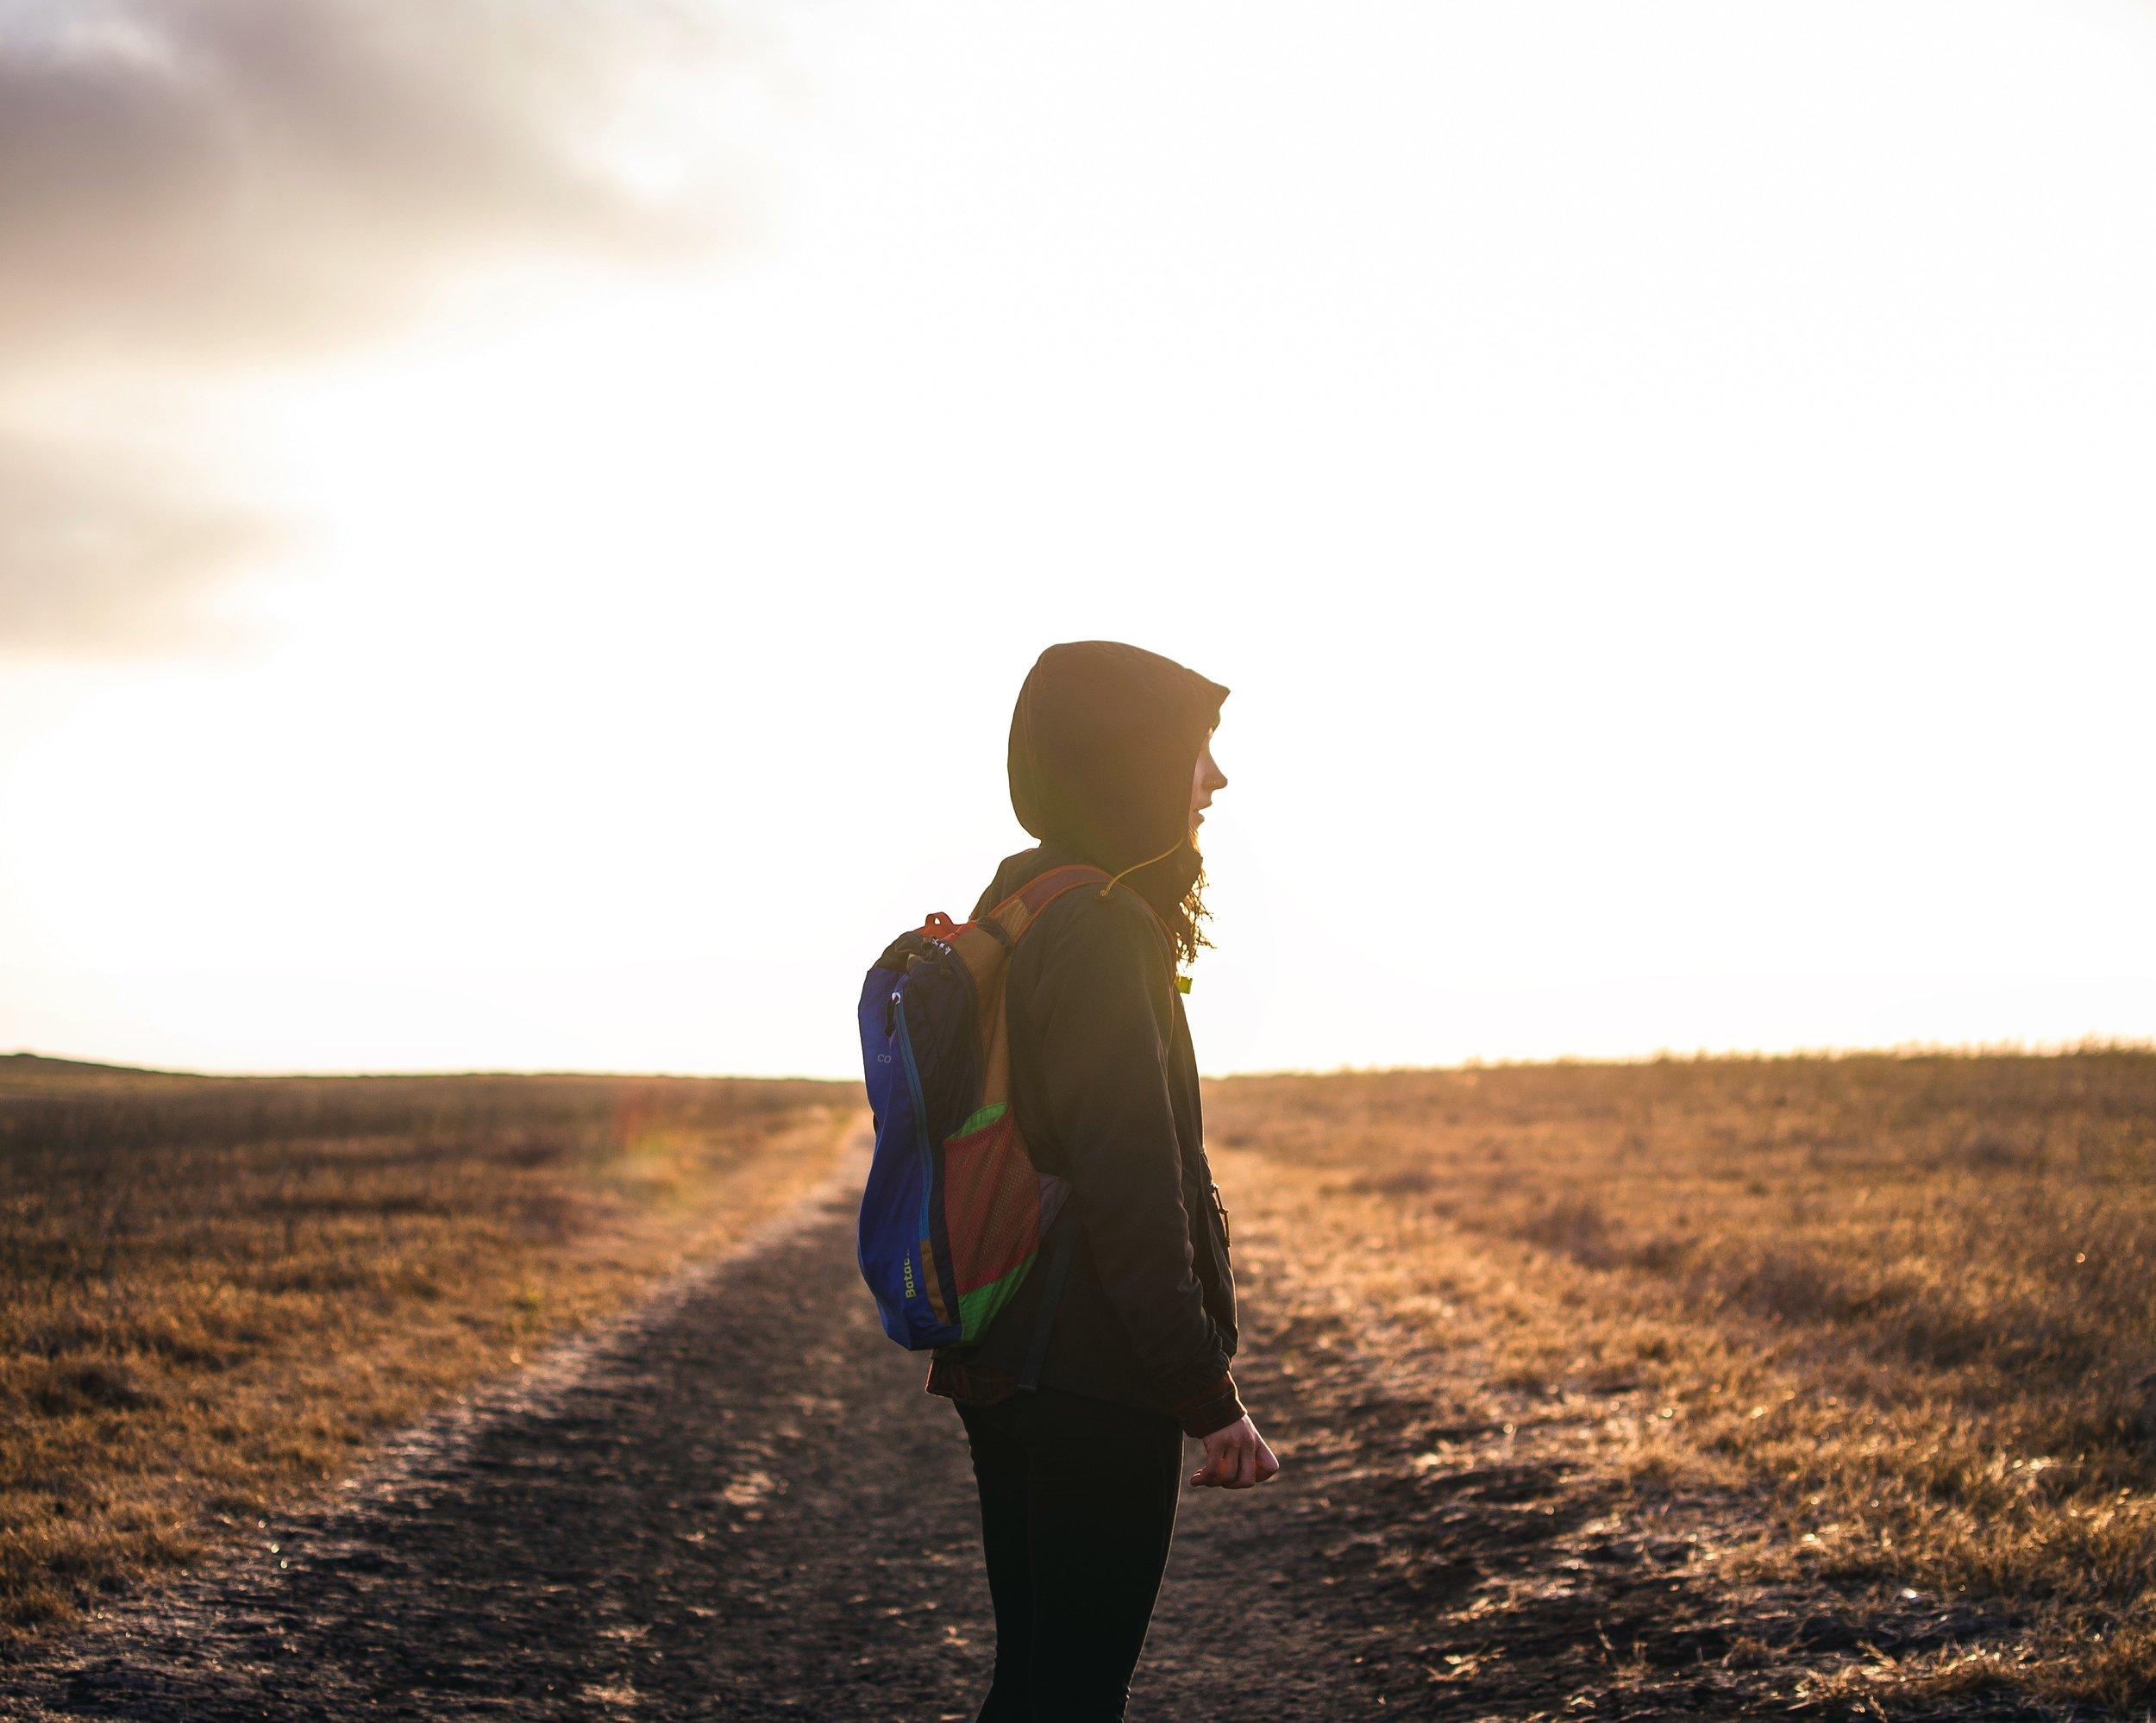 solo woman hiker in vast grassland